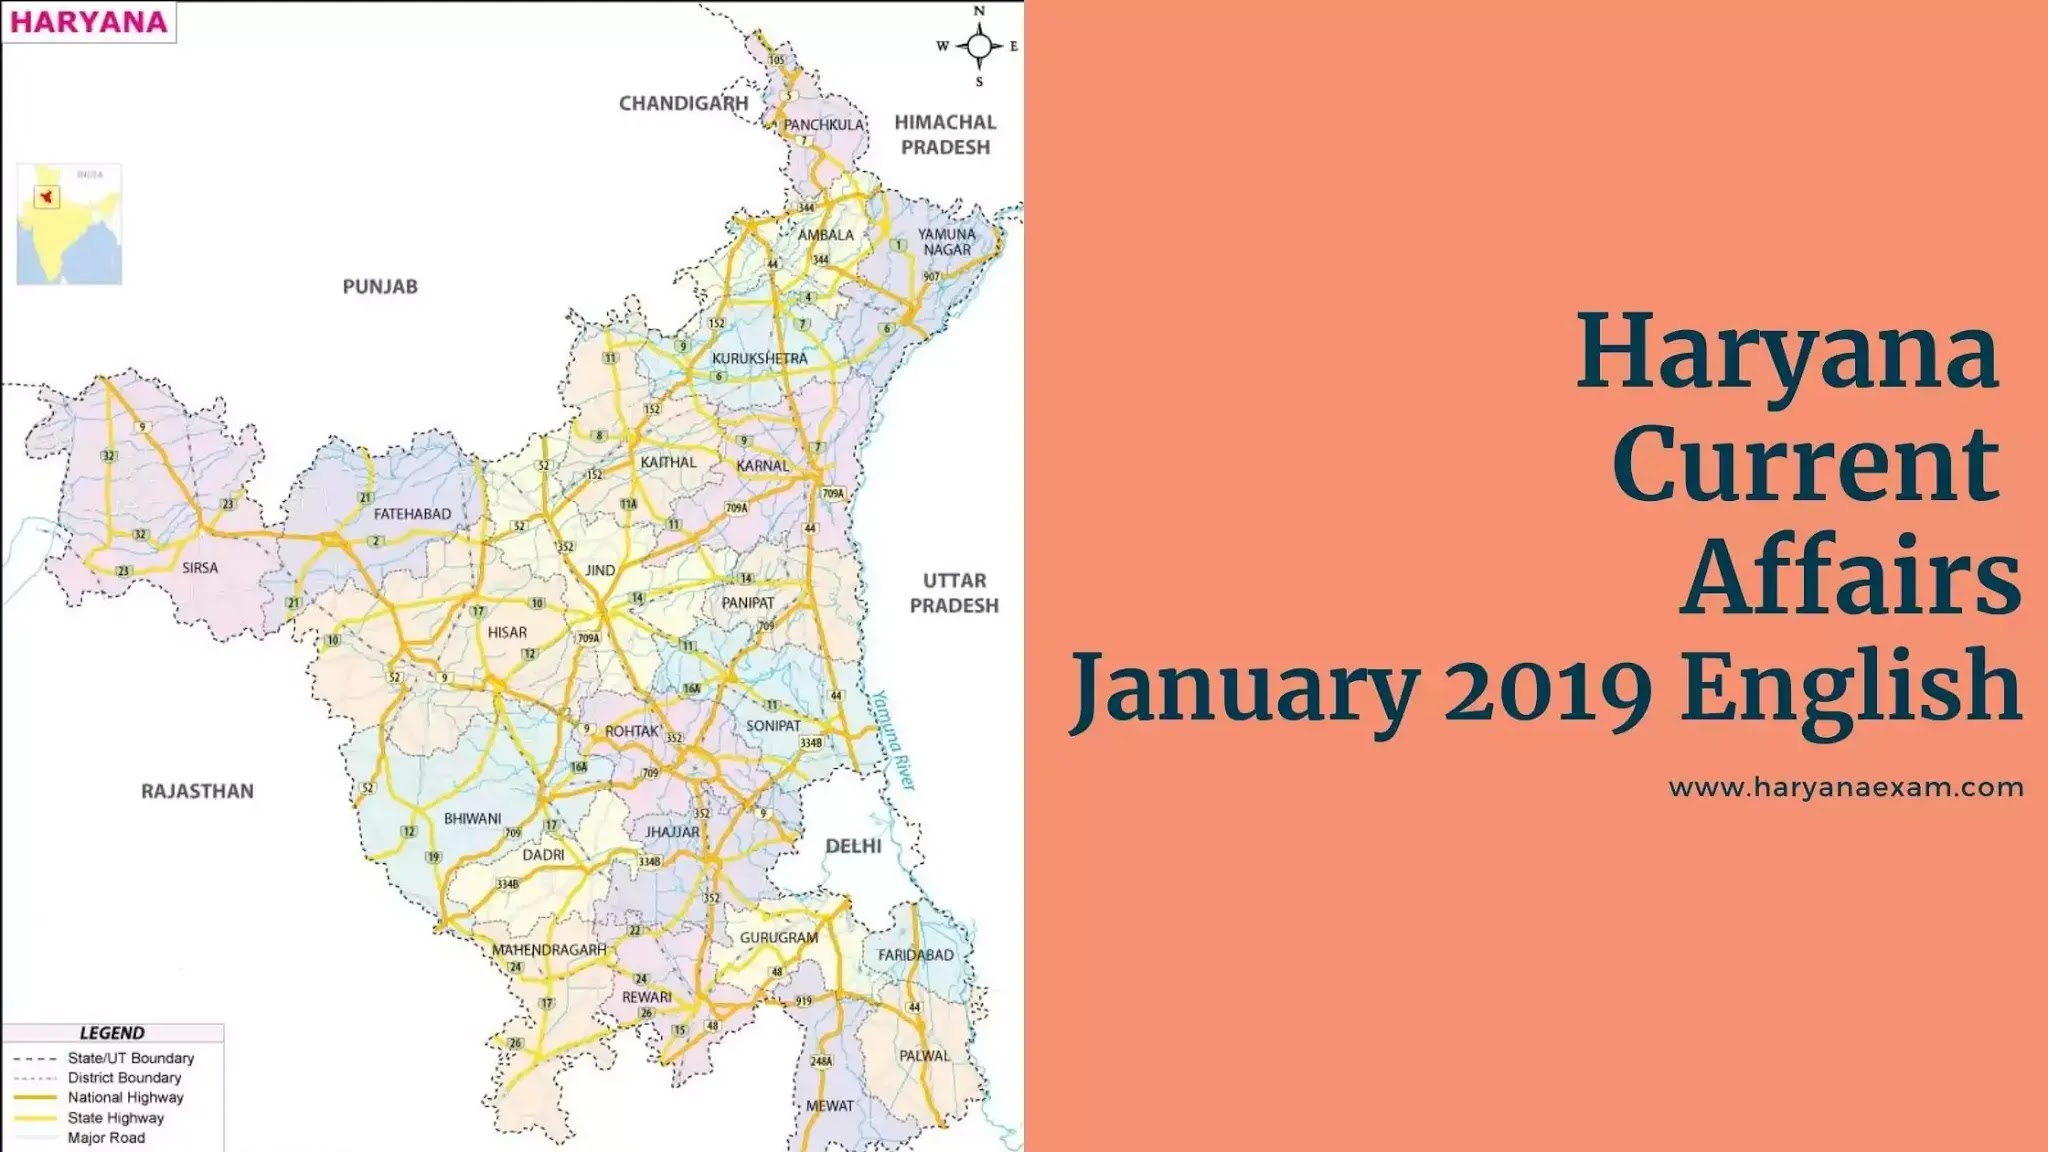 Haryana Current Affairs January 2019 in English